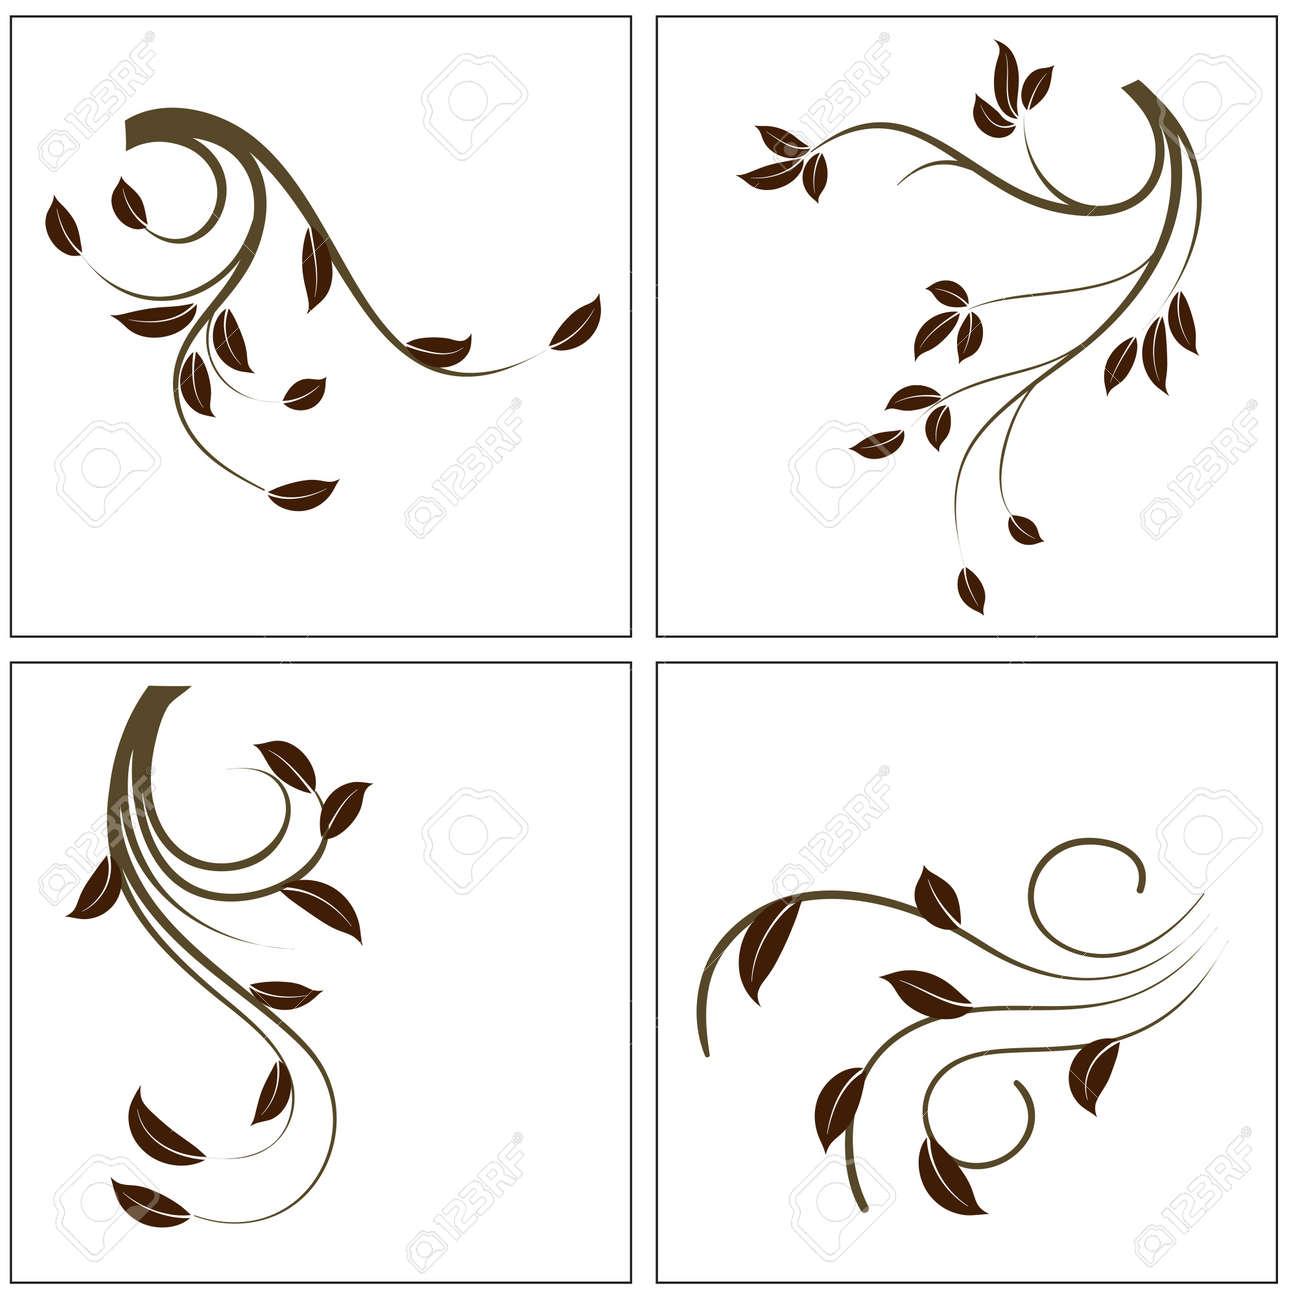 Decoration Plants Stock Vector - 11995757